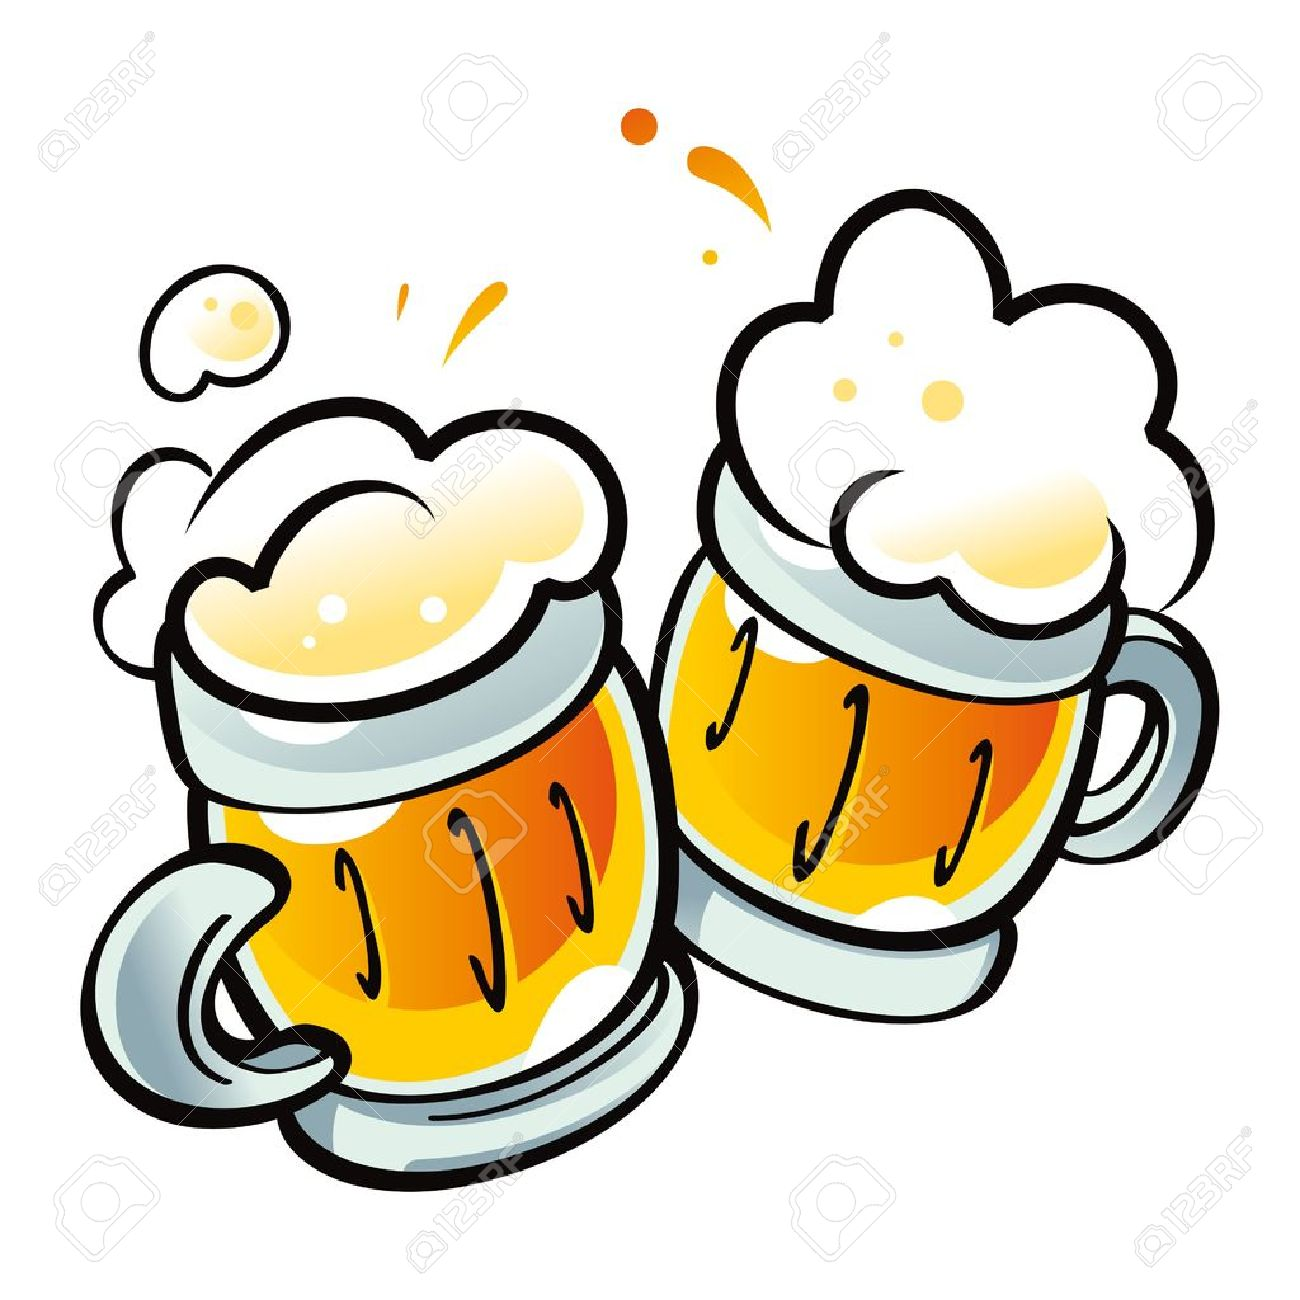 Alkohol trinken clipart. Alkoholflaschen clipartfest bierkrgen